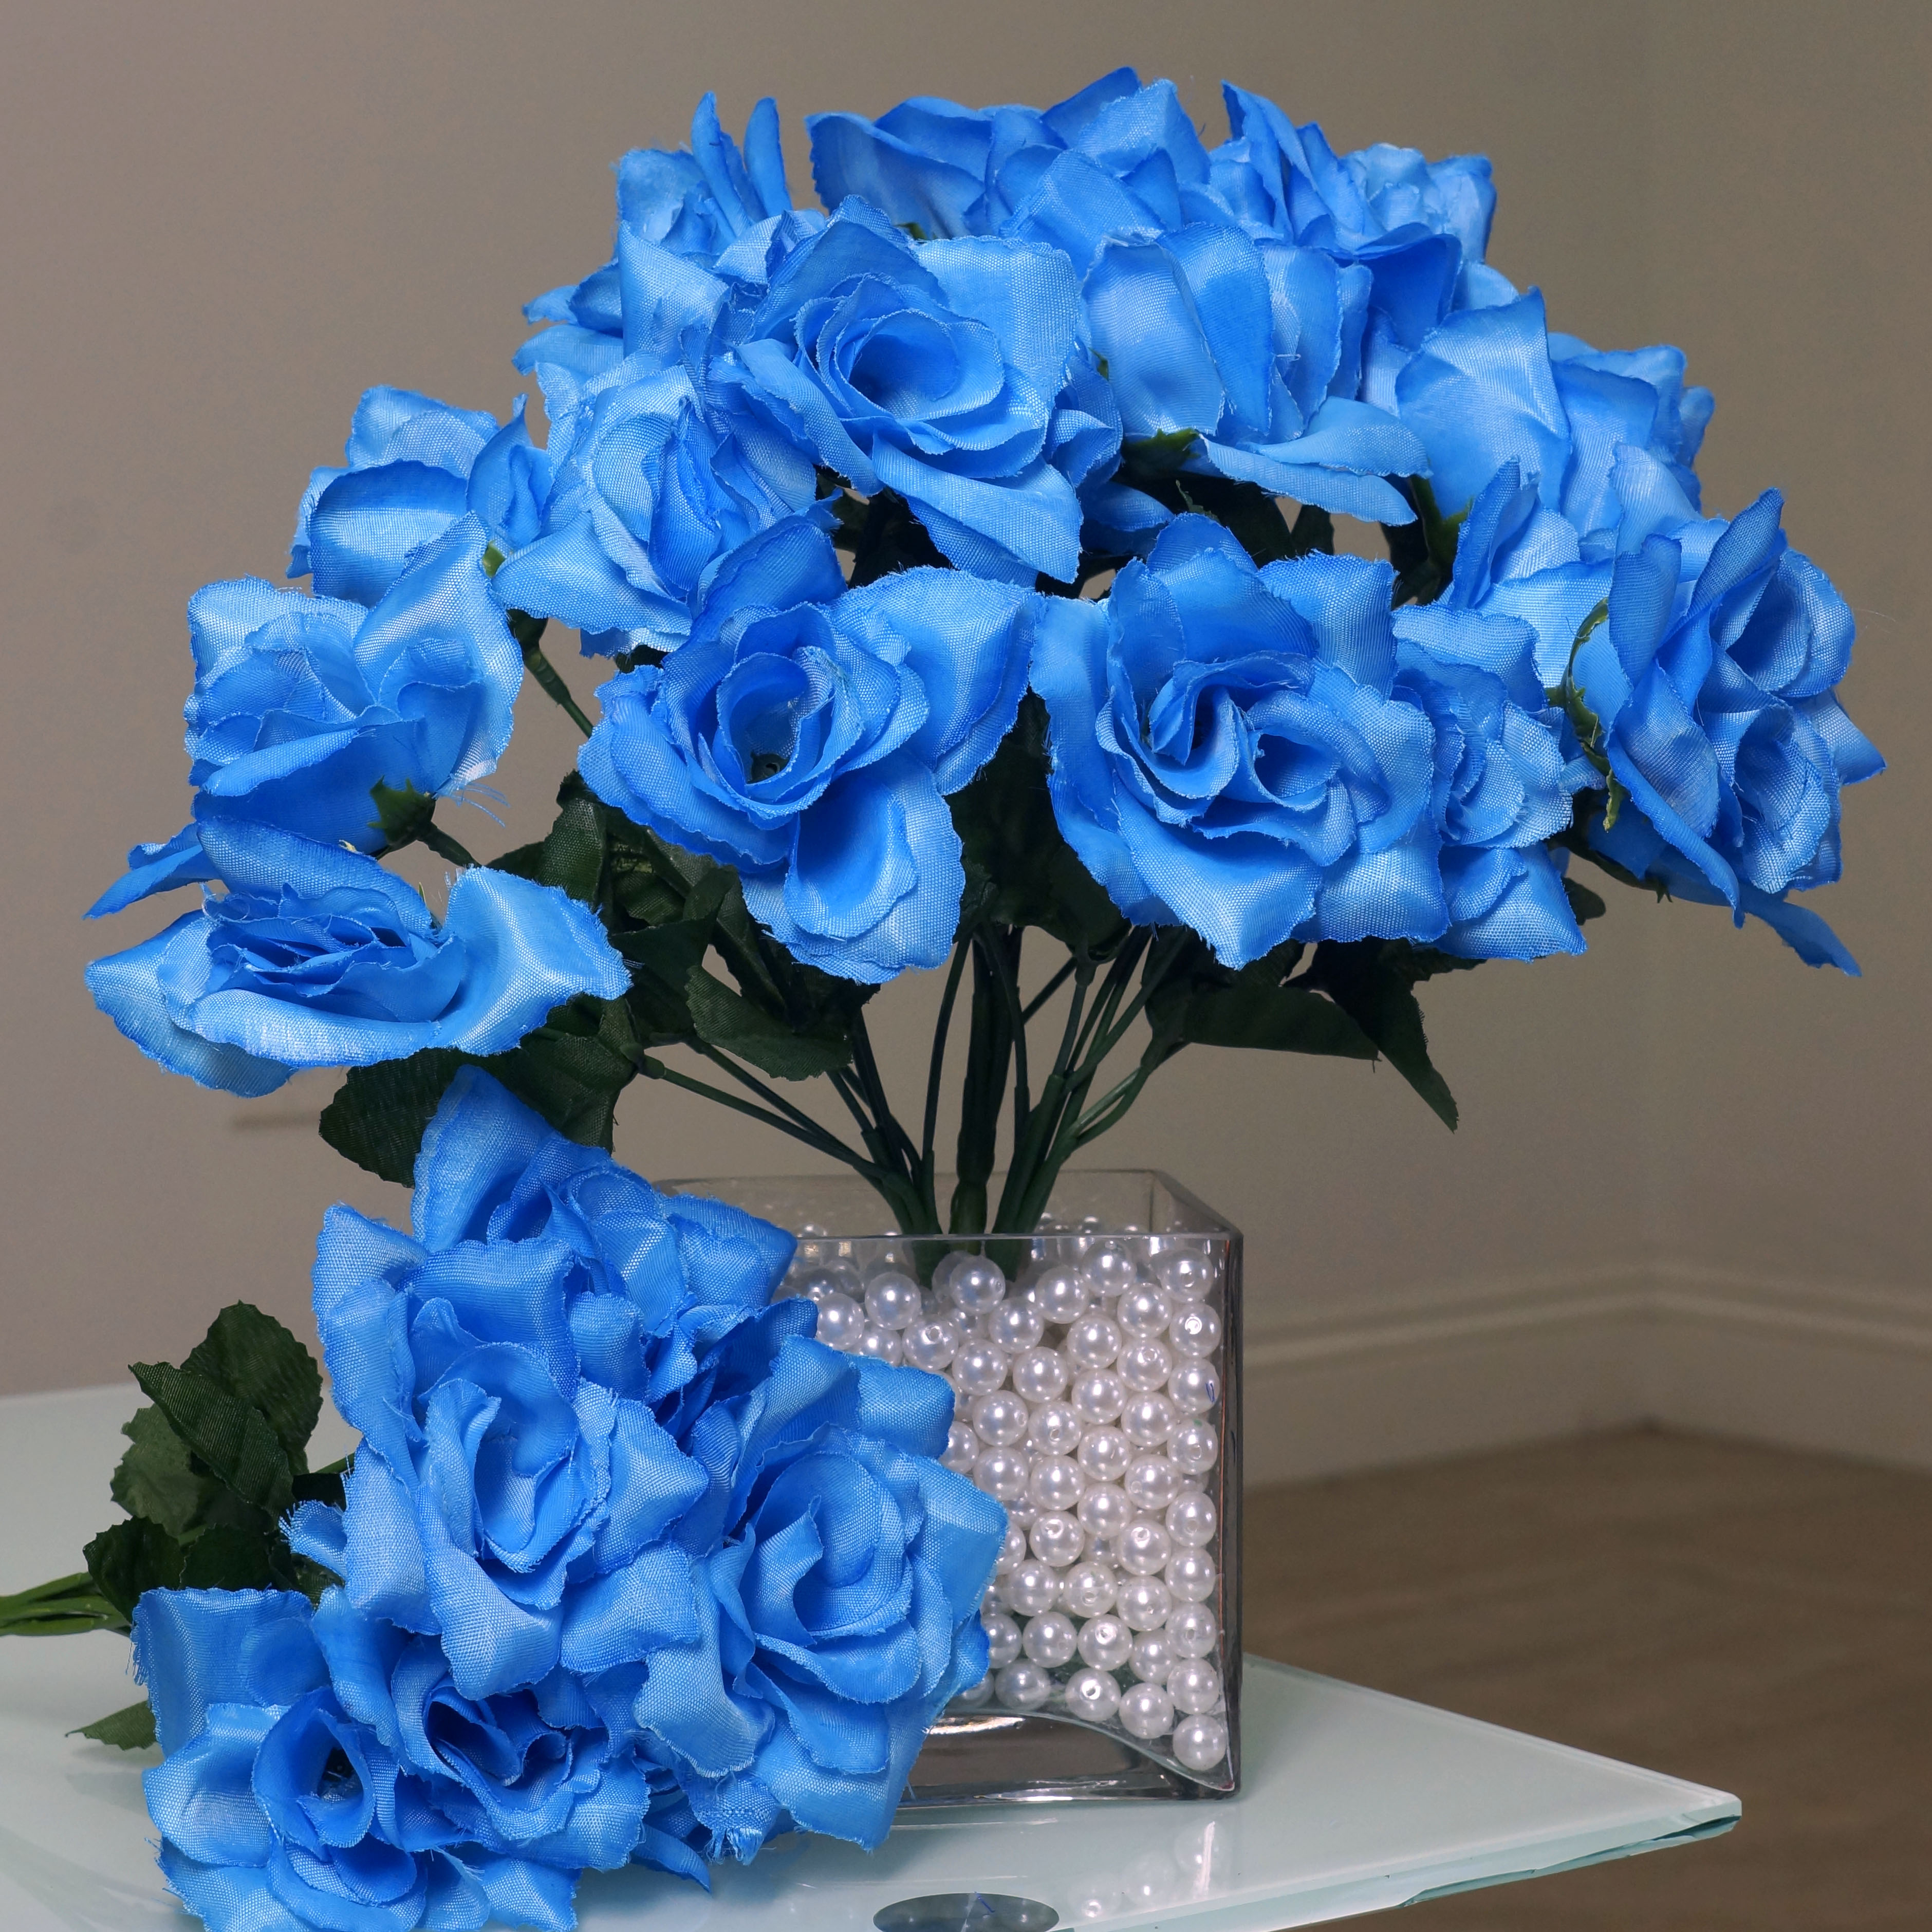 BalsaCircle 84 Silk Open Roses Bouquets - DIY Home Wedding Party Artificial Flowers Arrangements Centerpieces